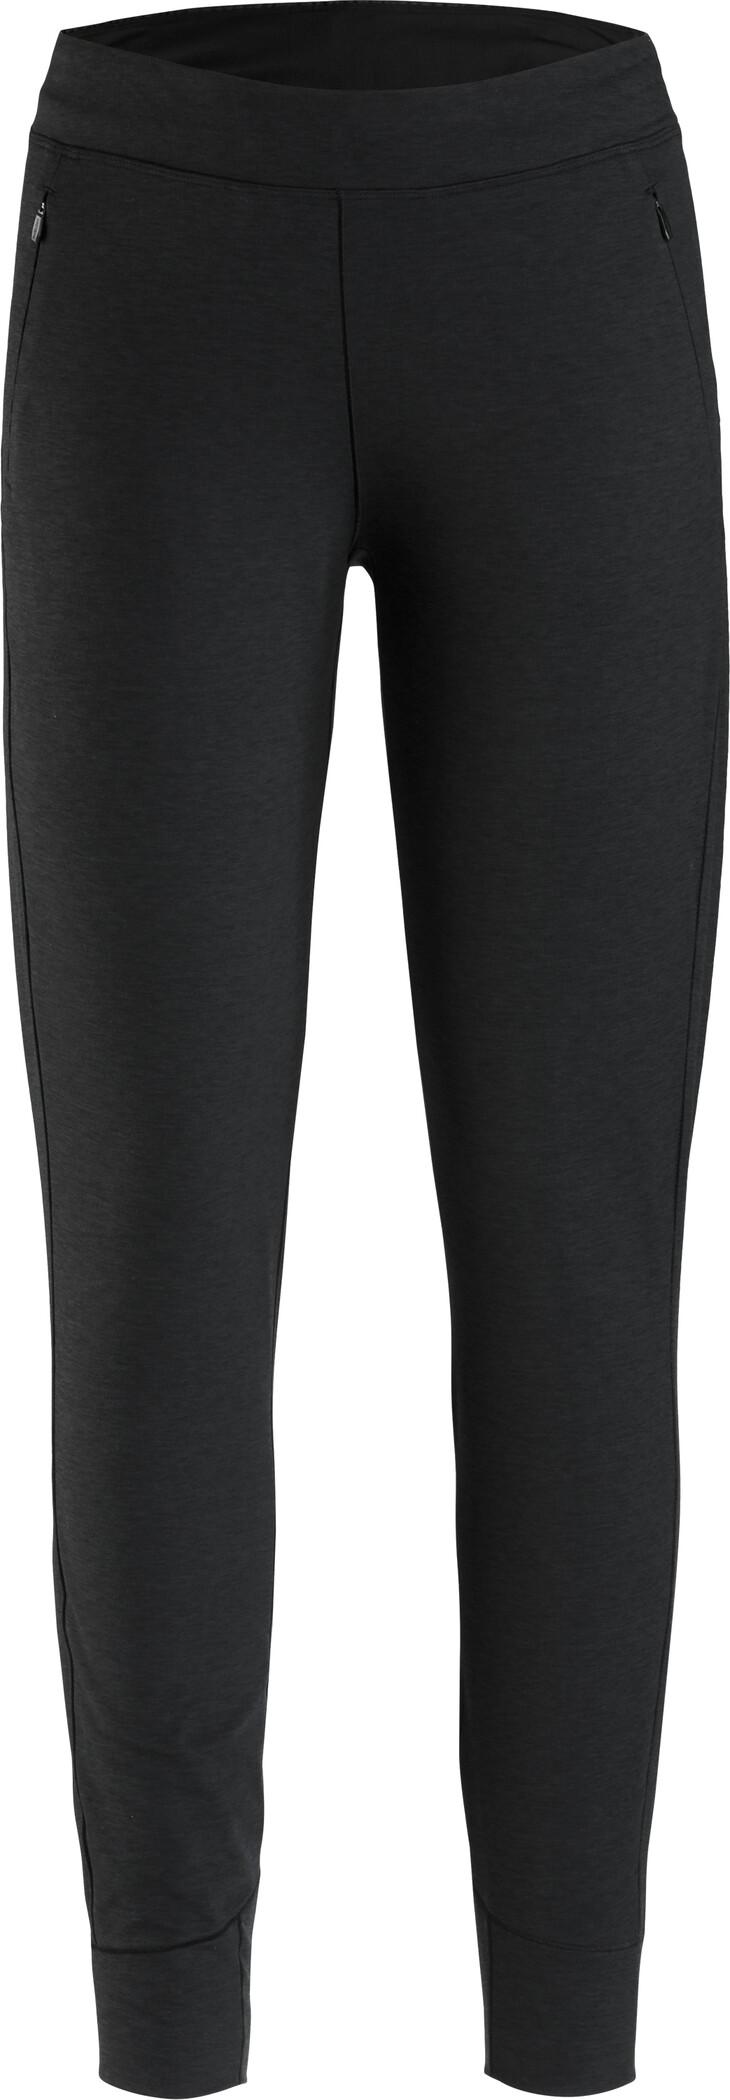 Arc'teryx Taema Bukser Damer, black (2019)   Trousers